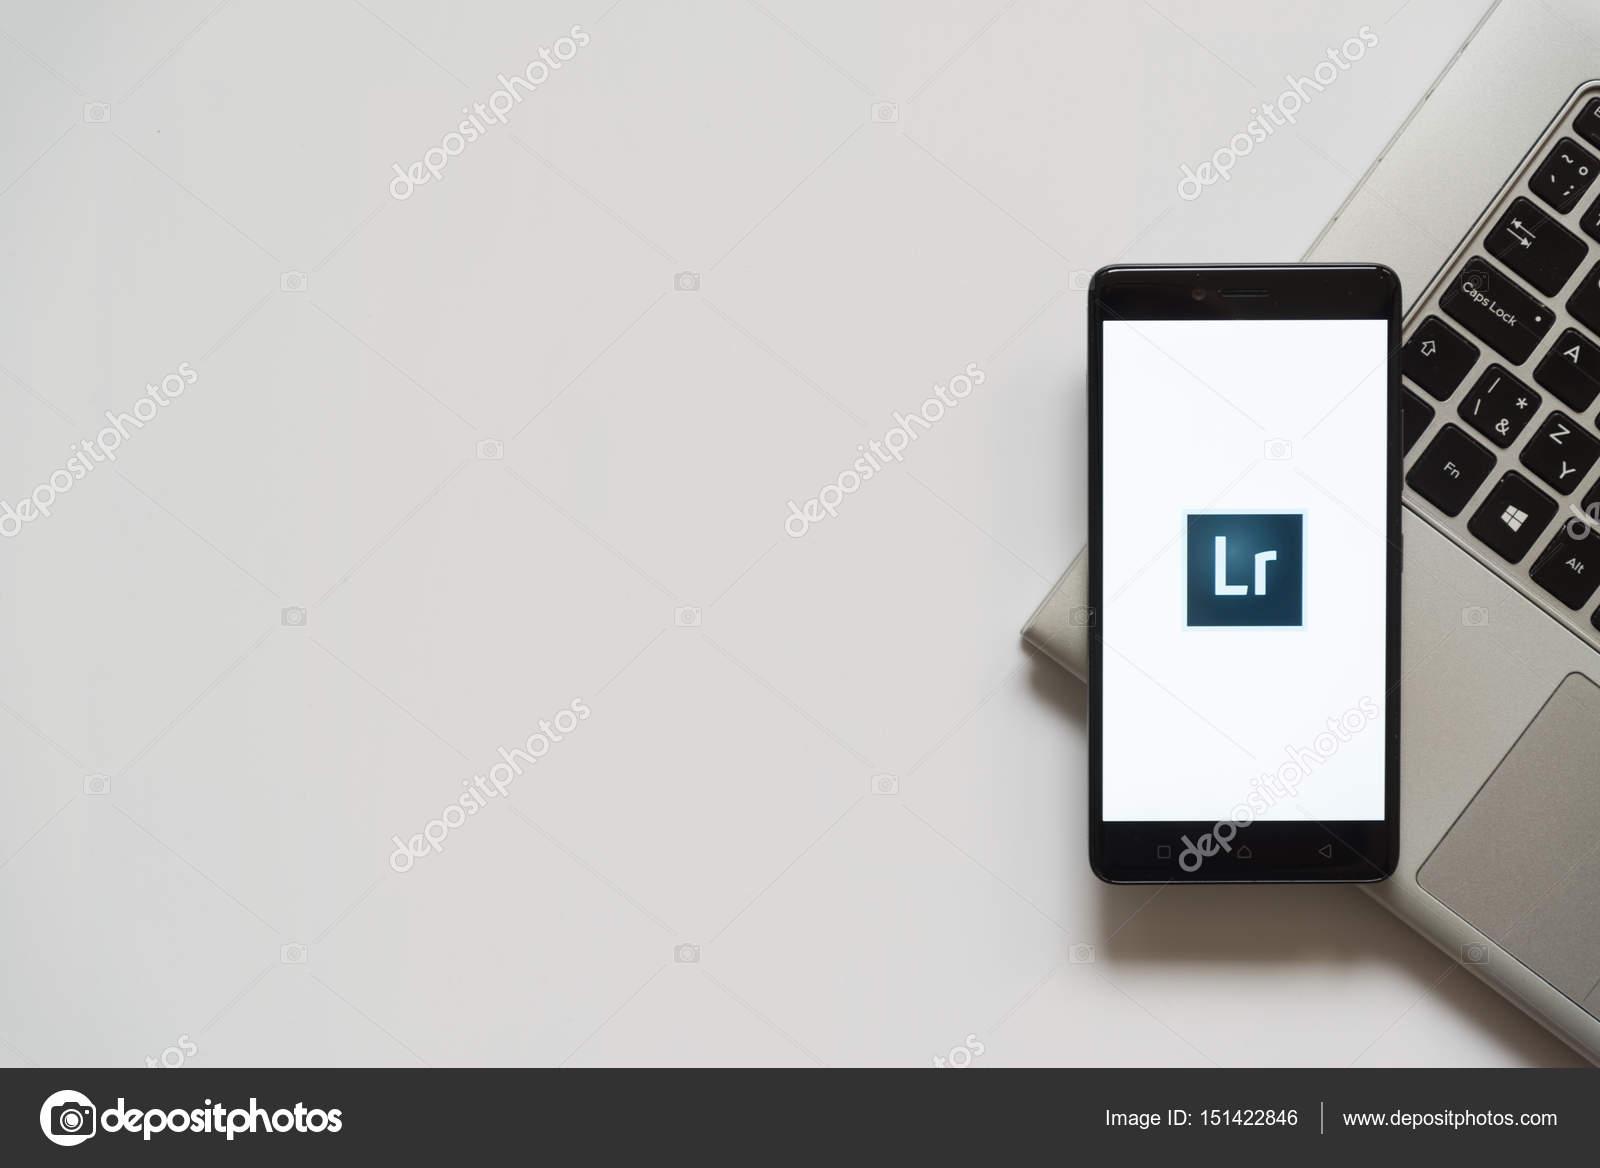 Adobe photoshop lightroom on smartphone screen – Stock